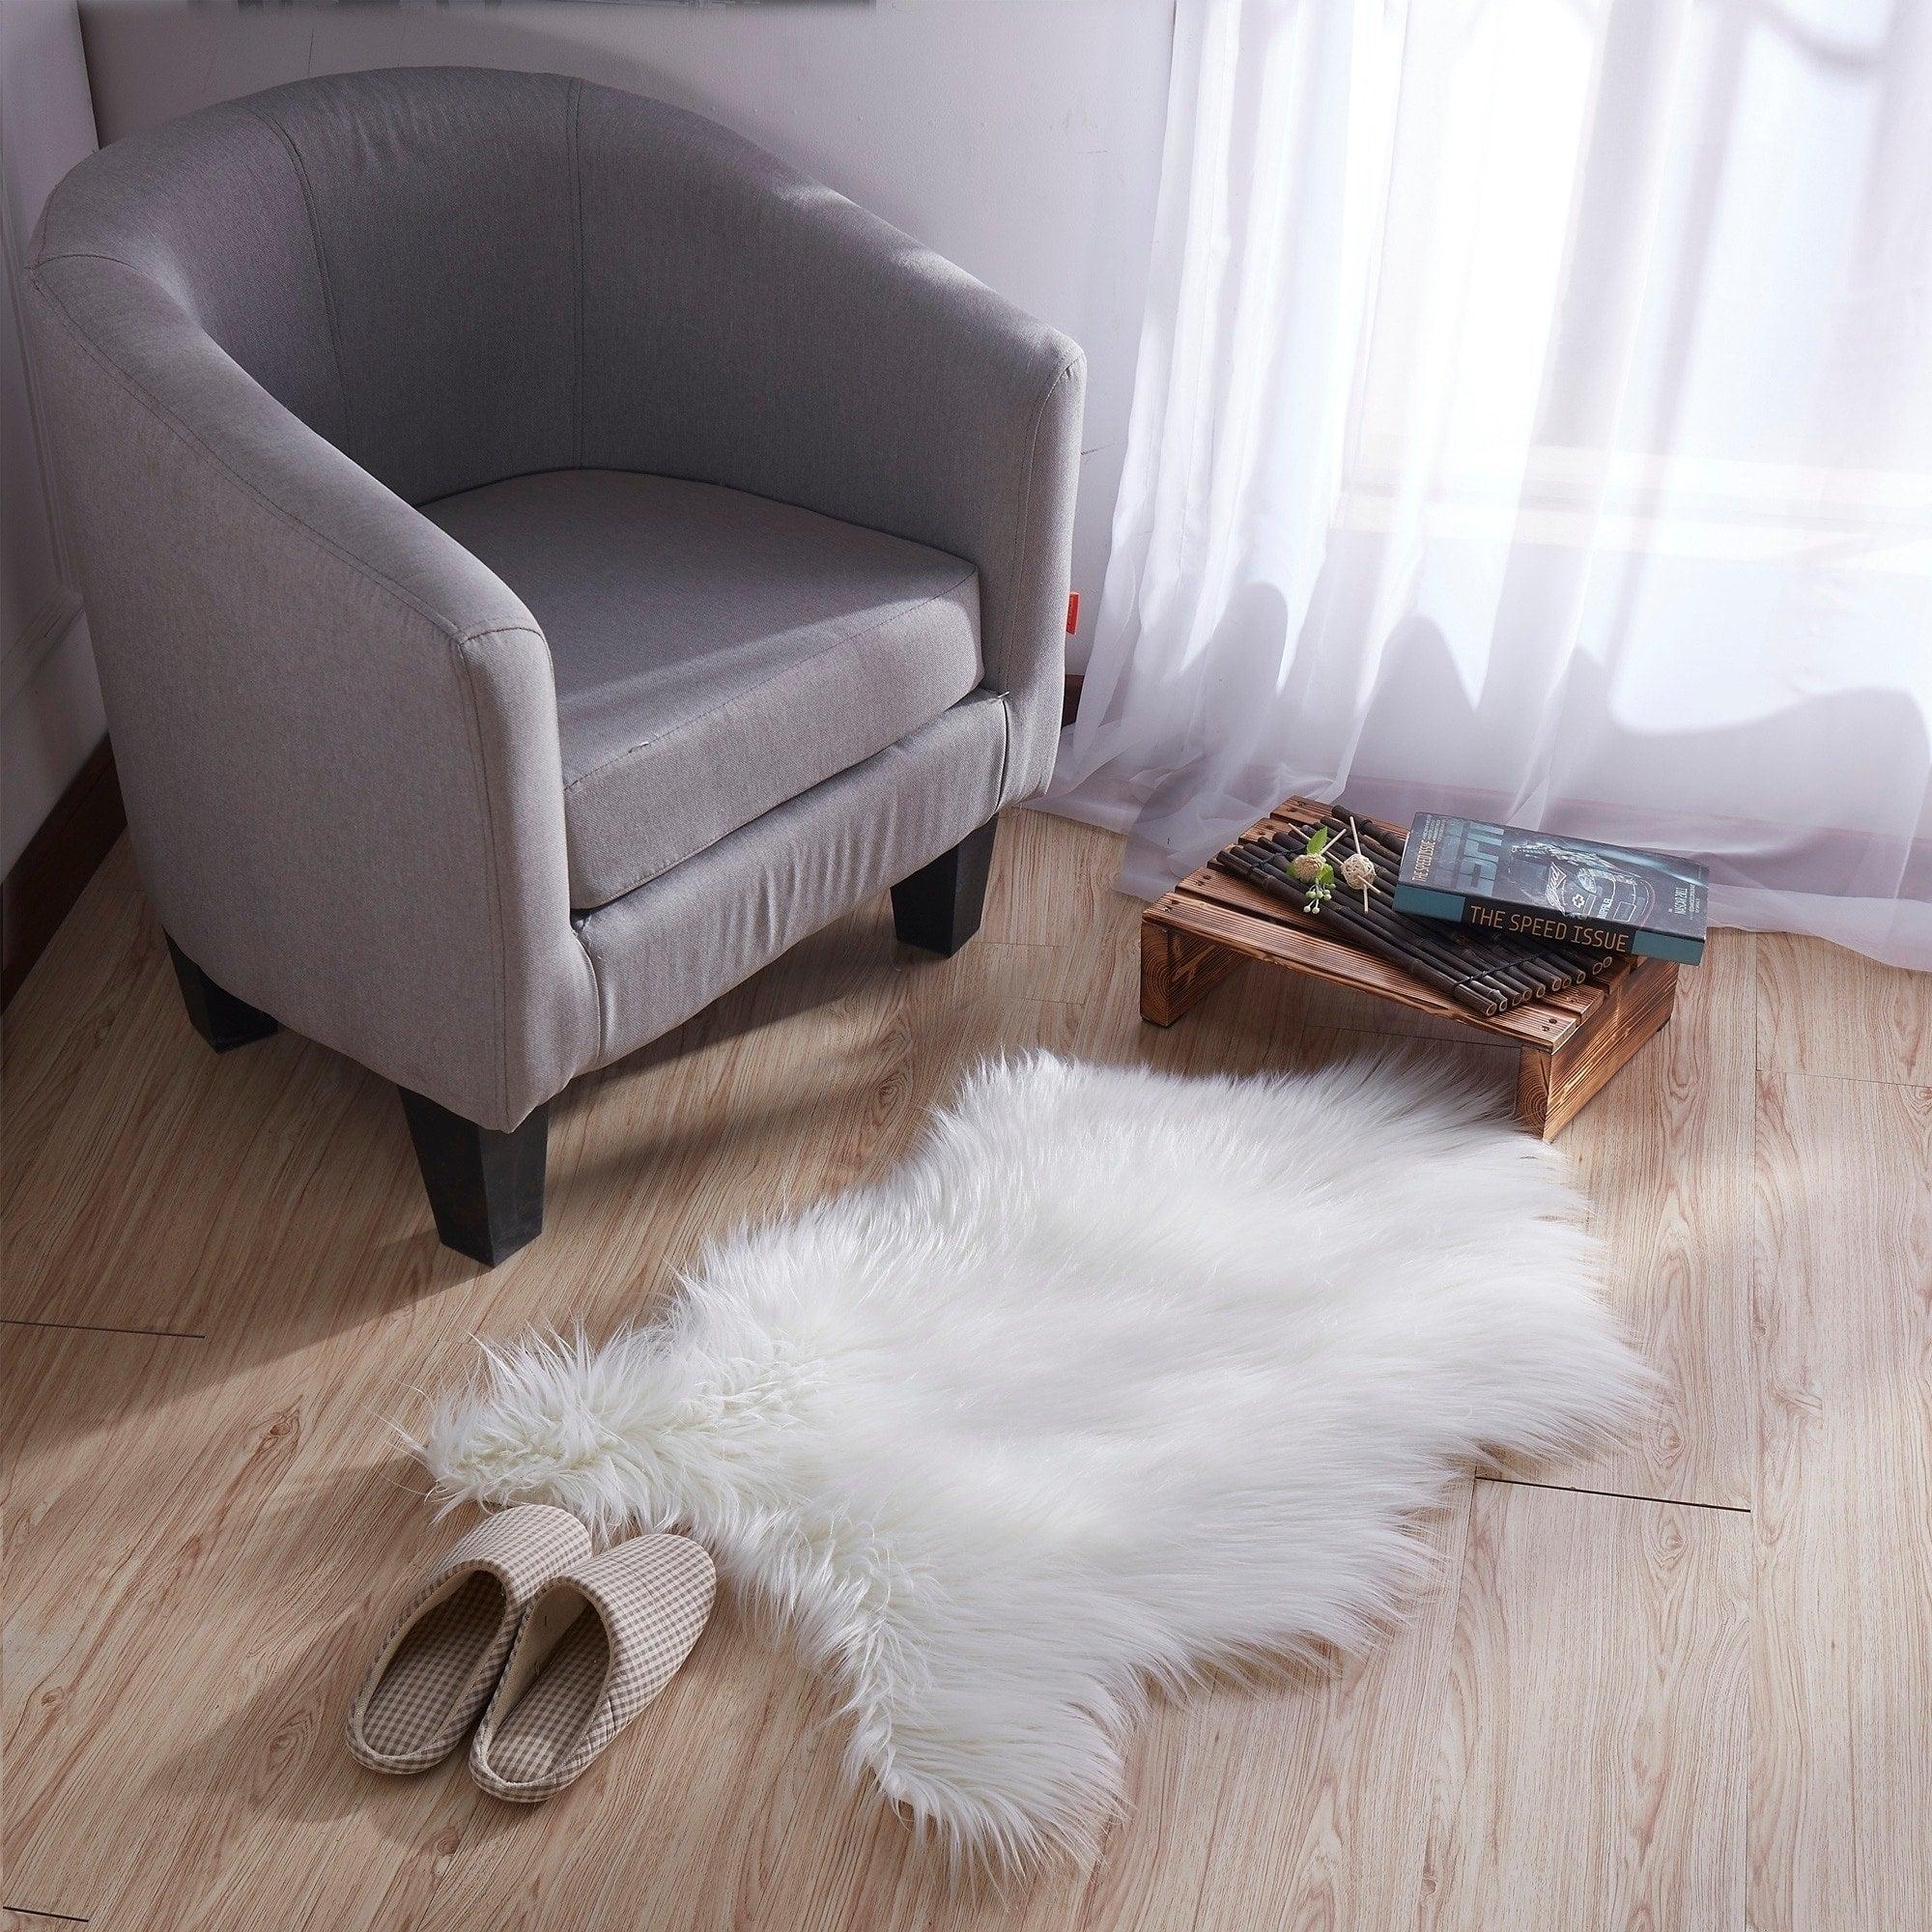 Shop Ottomanson Soft High Pile Faux Sheepskin Chair Cover Seat Pad